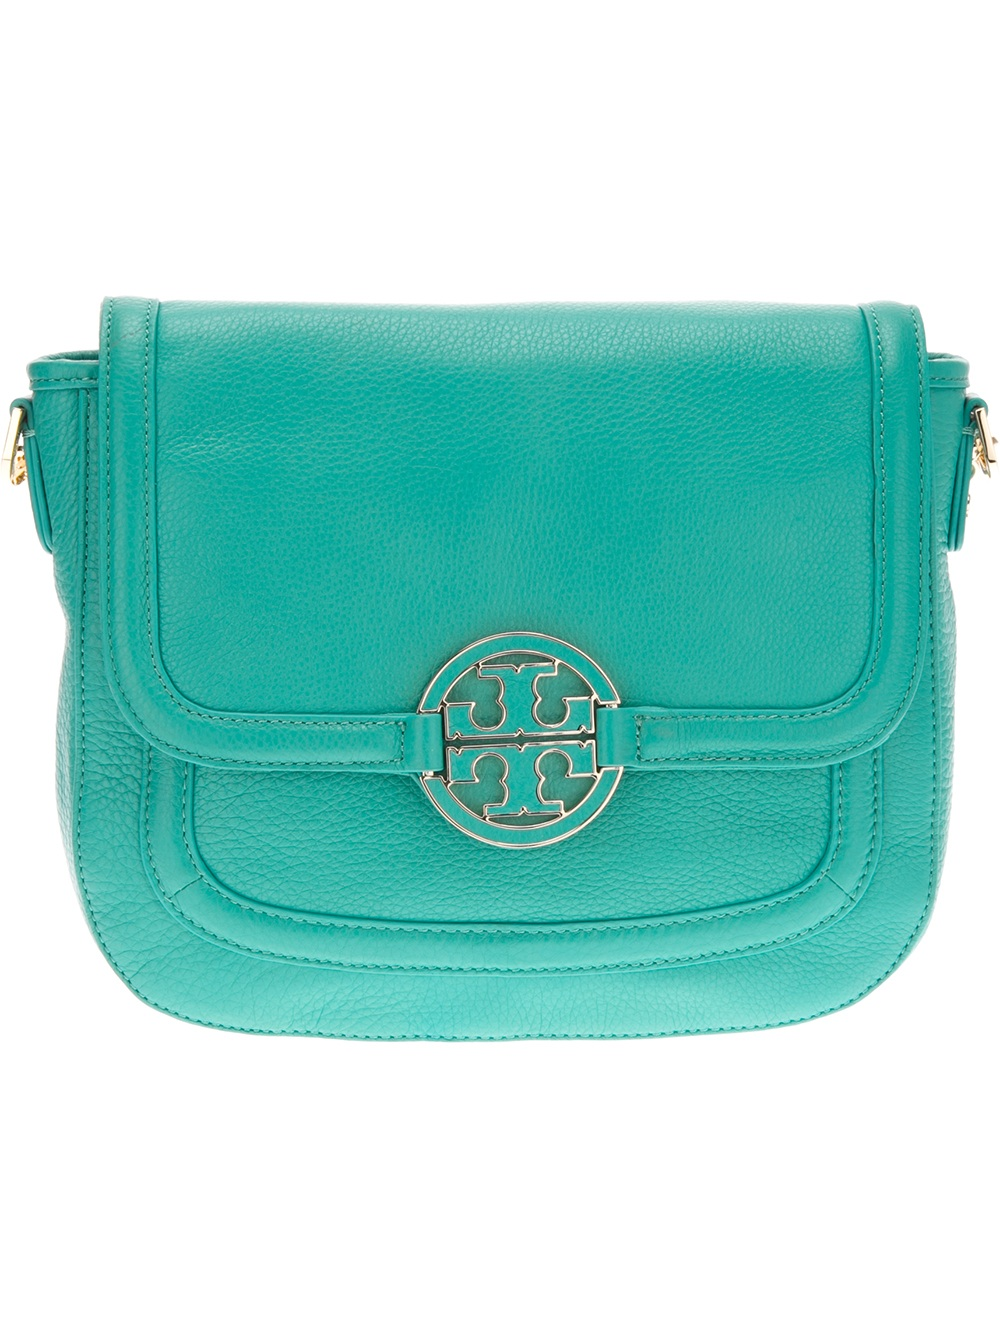 Tory Burch Shoulder Bag In Green Mint Lyst